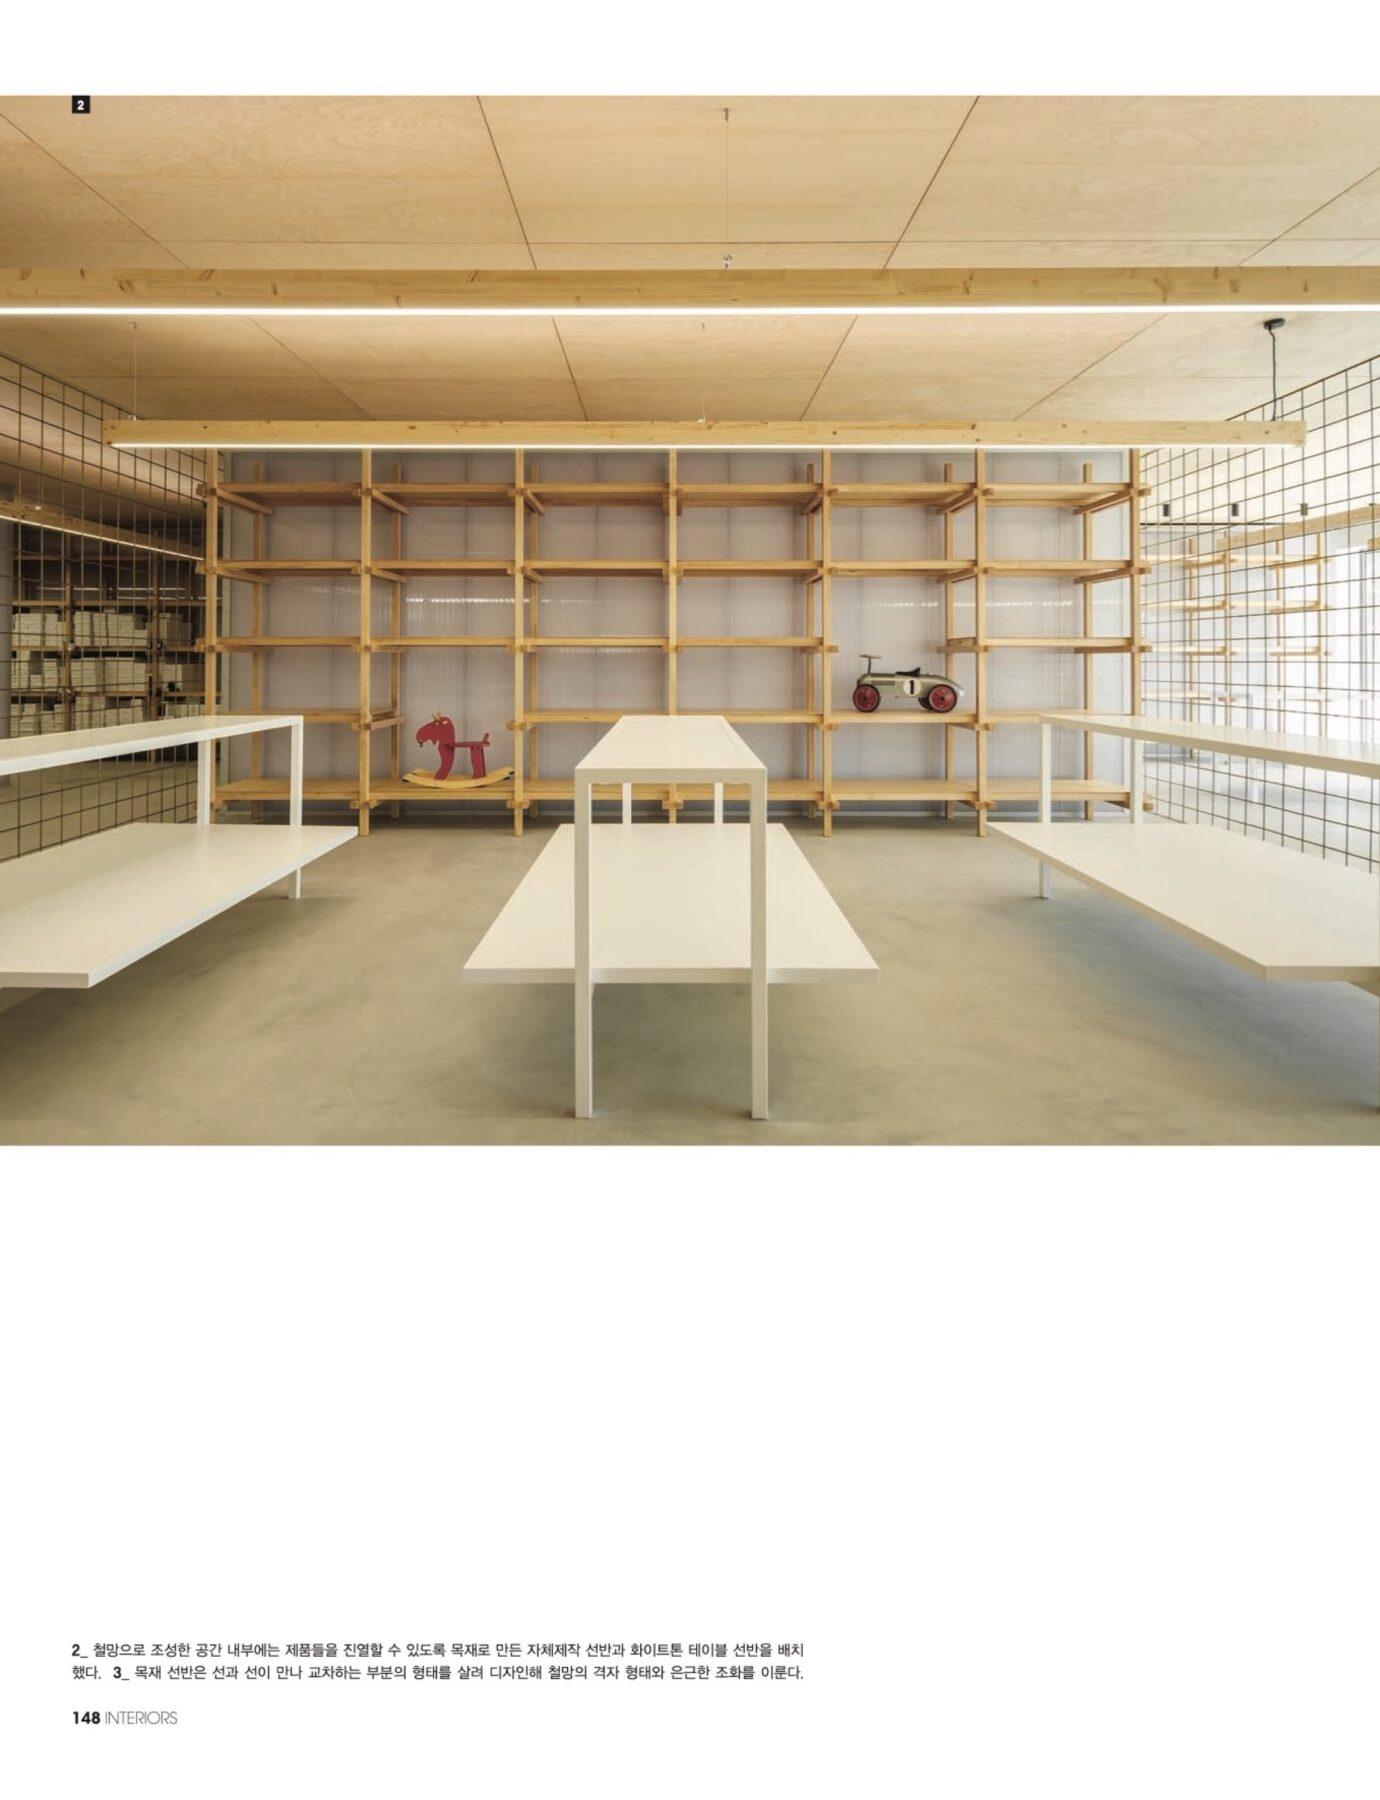 interiors korea studere aramazens morinha 413 5 5